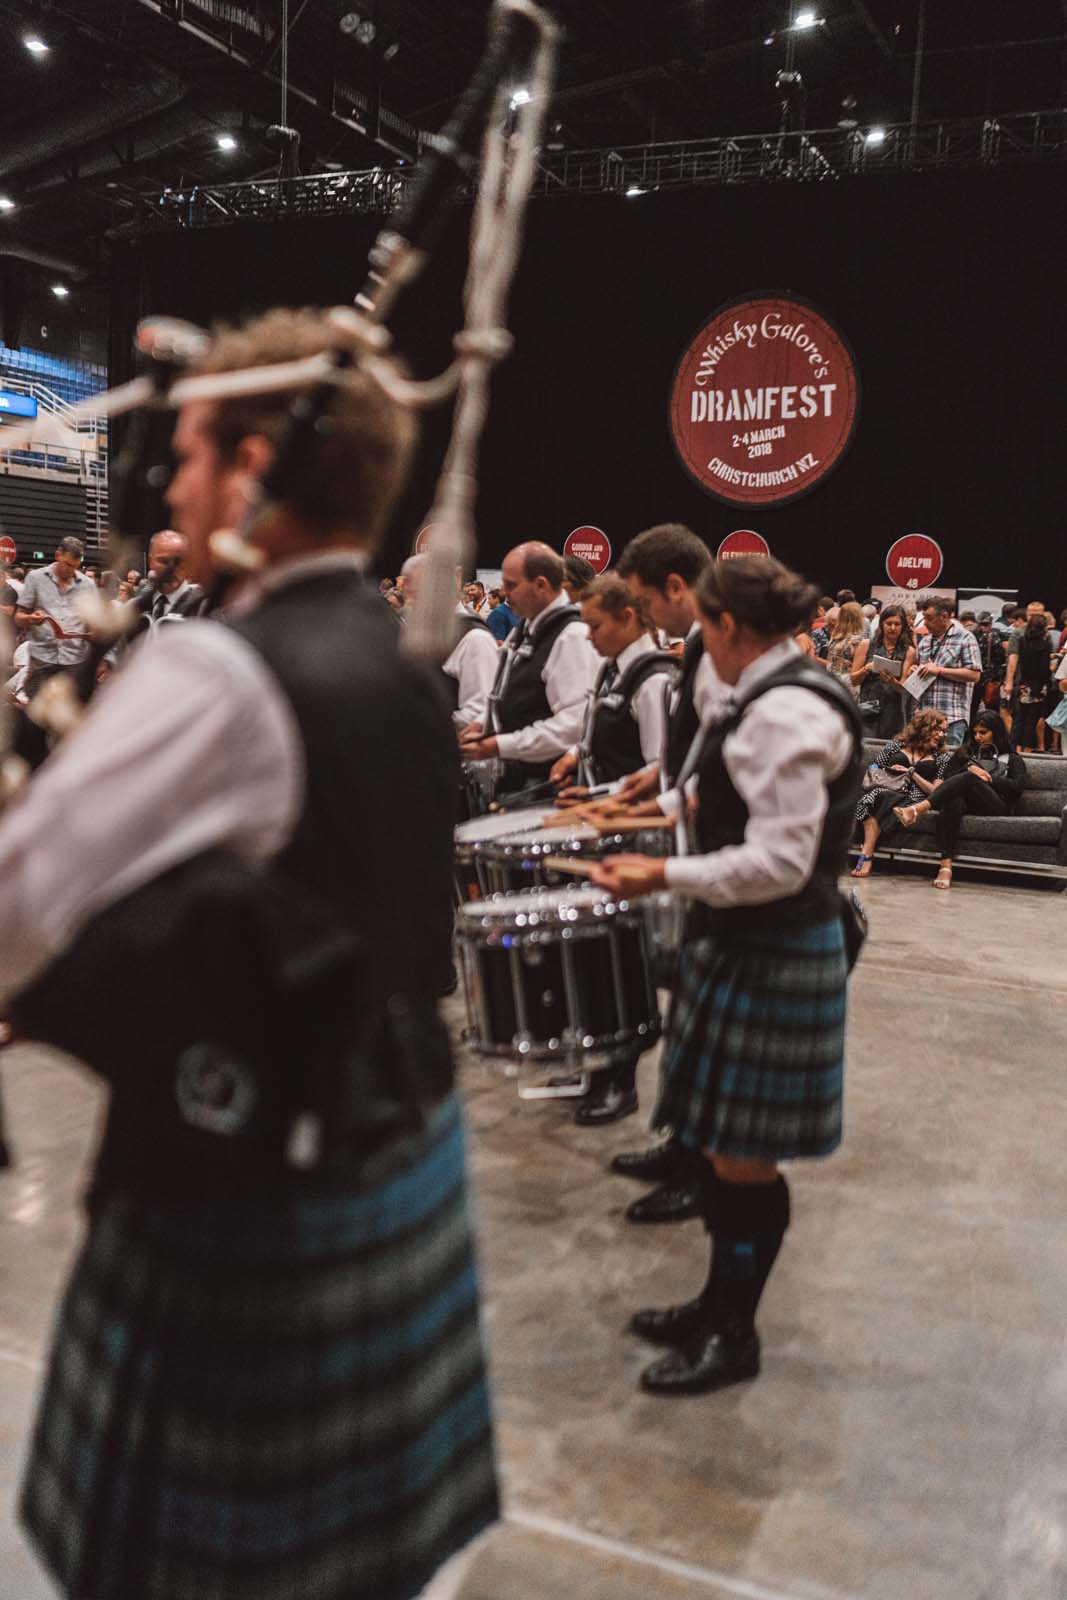 Dramfest 2018 for Whisky Galore-403.jpg